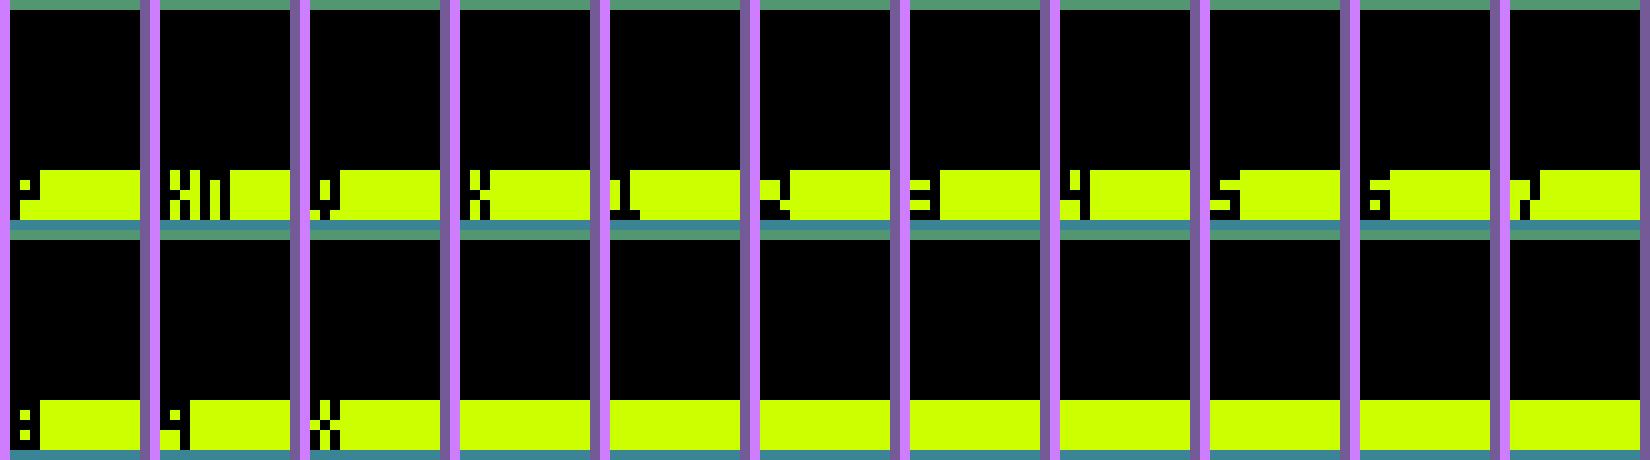 tarot - minor arcana